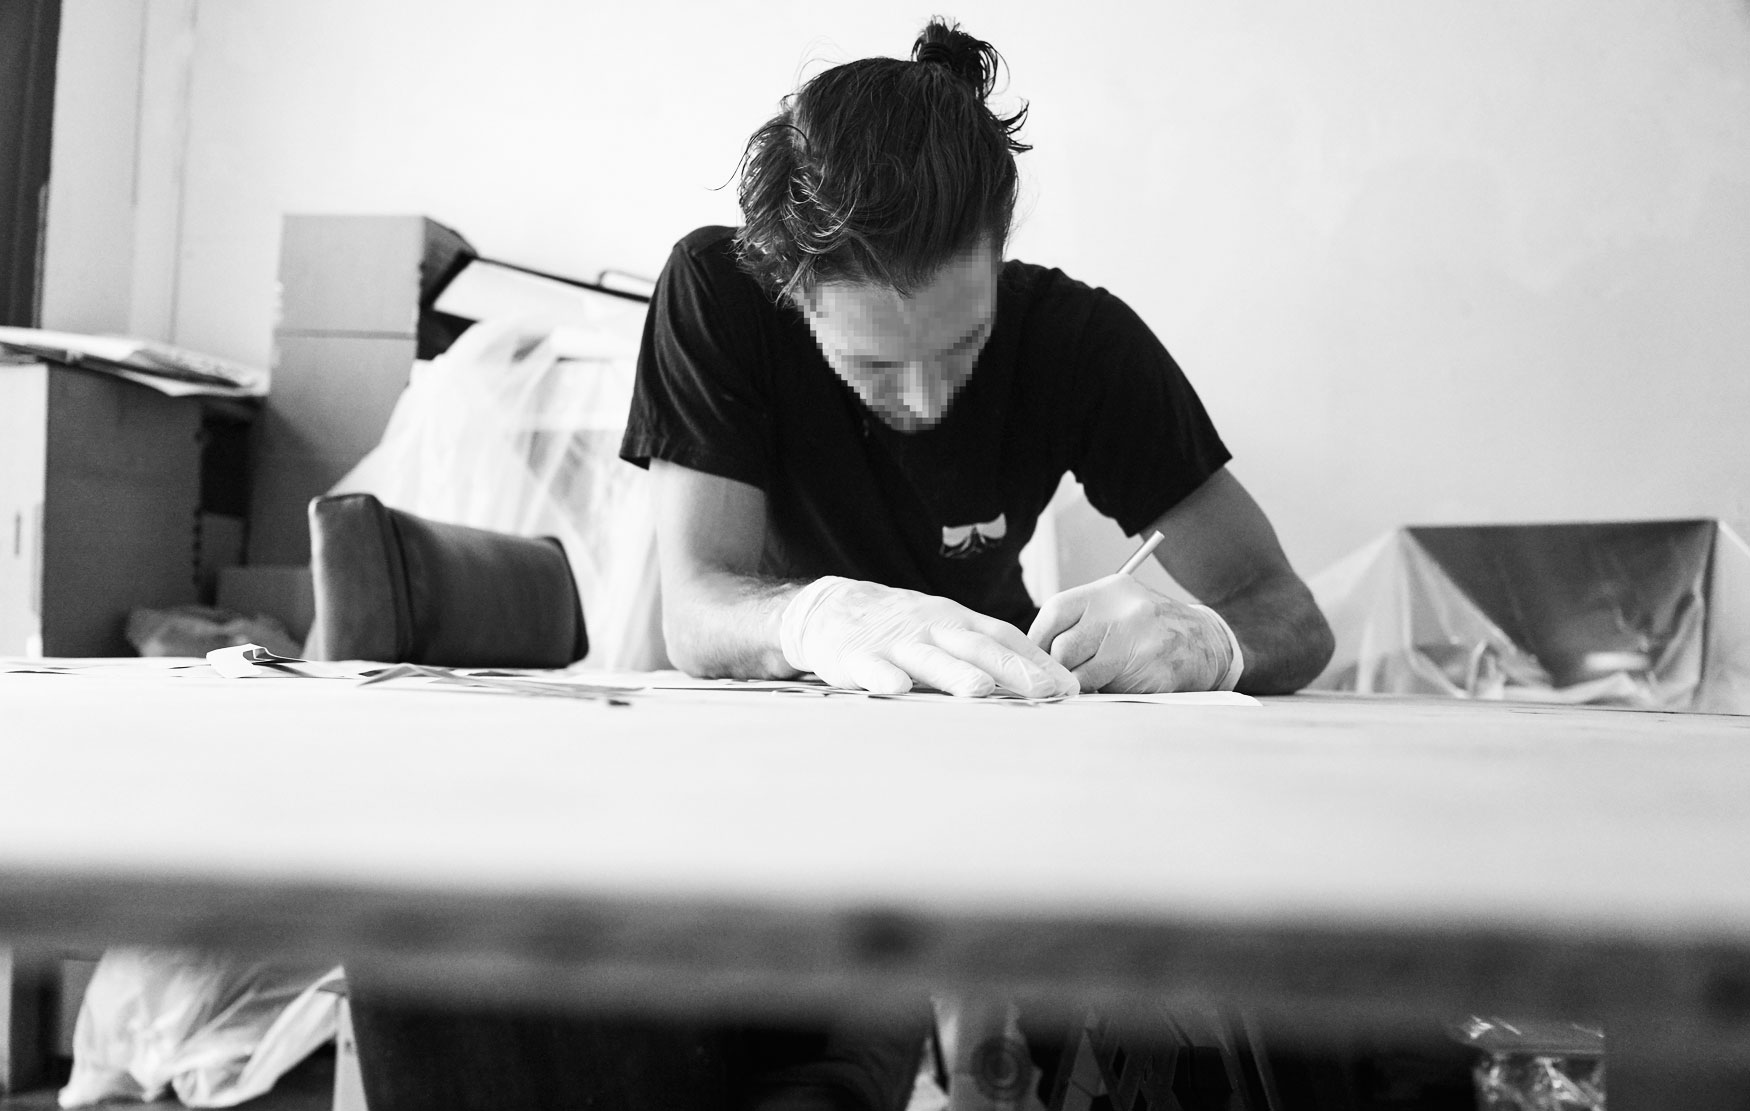 Thrashbird: Dave Navarro Installation | Story 008 | Tuesday, July 10, 2018